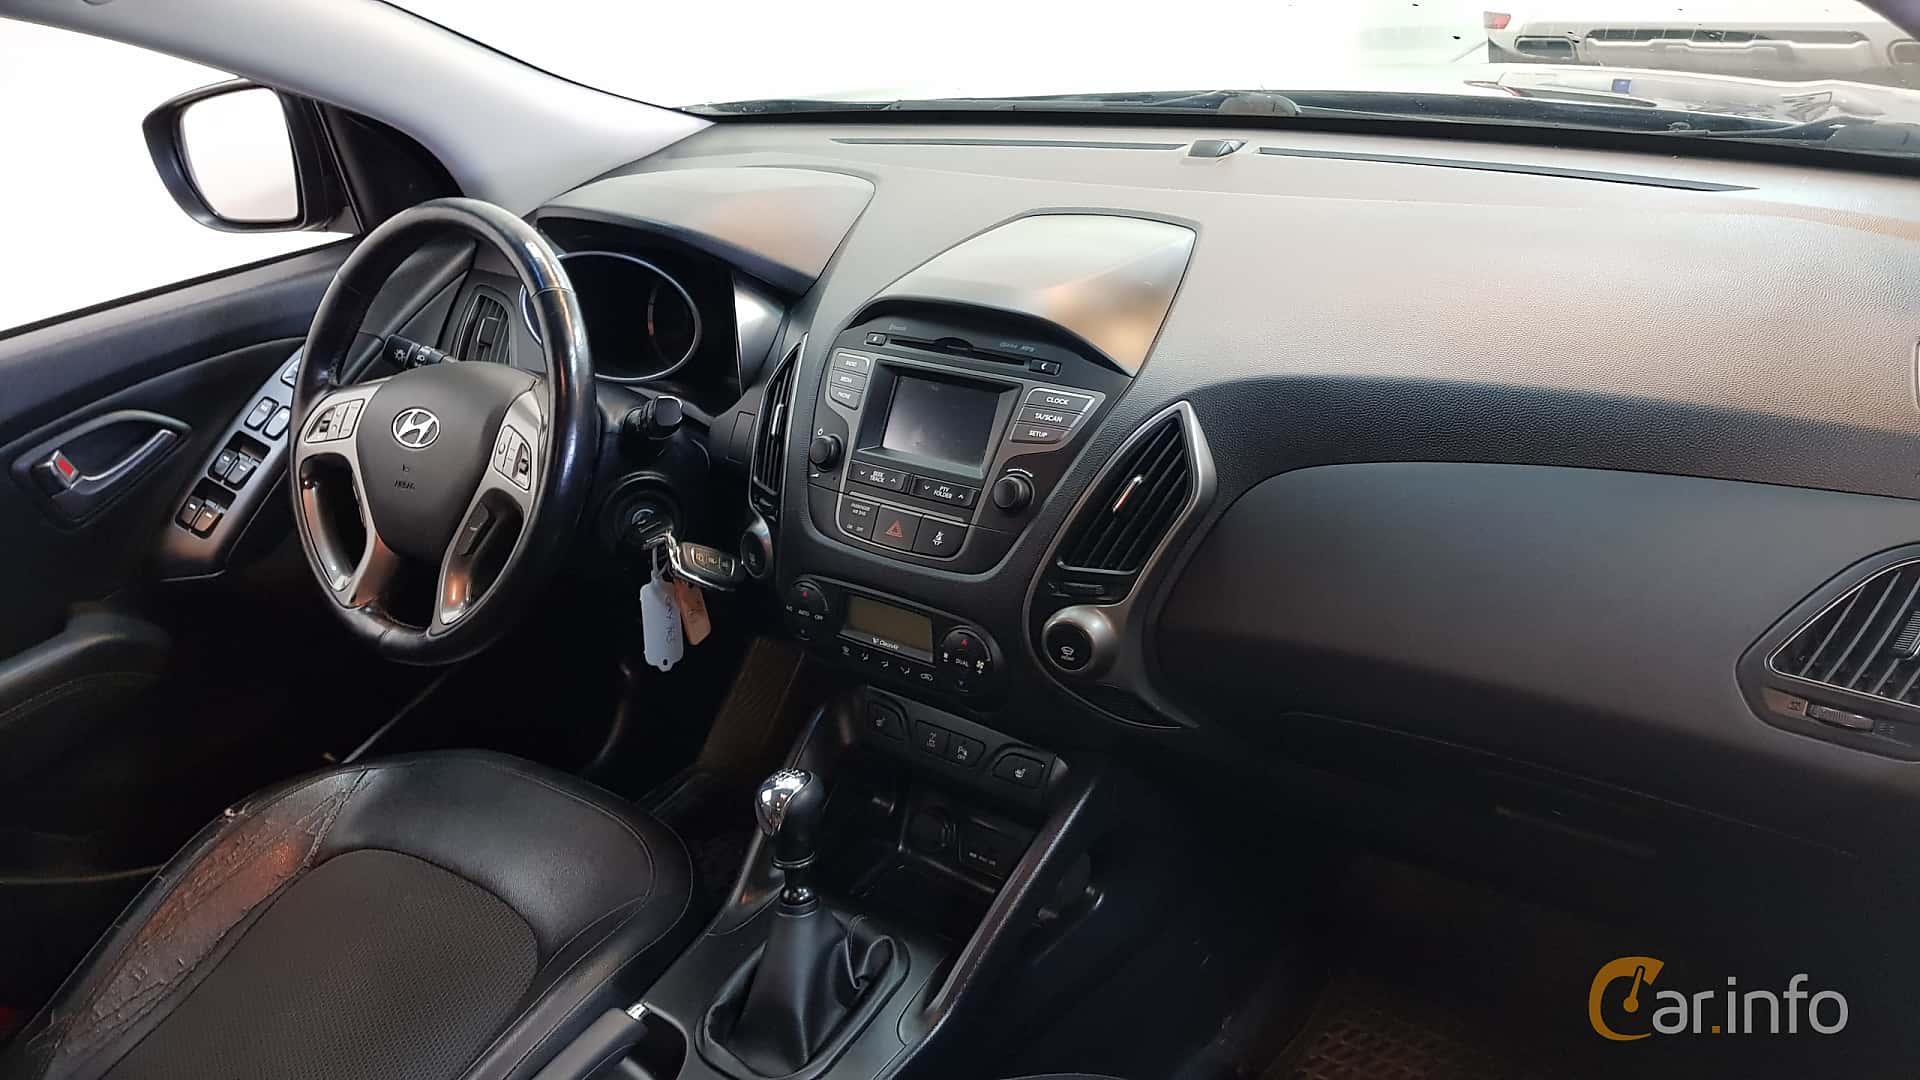 https://s.car.info/image_files/1920/hyundai-ix35-interior-2-502310.jpg